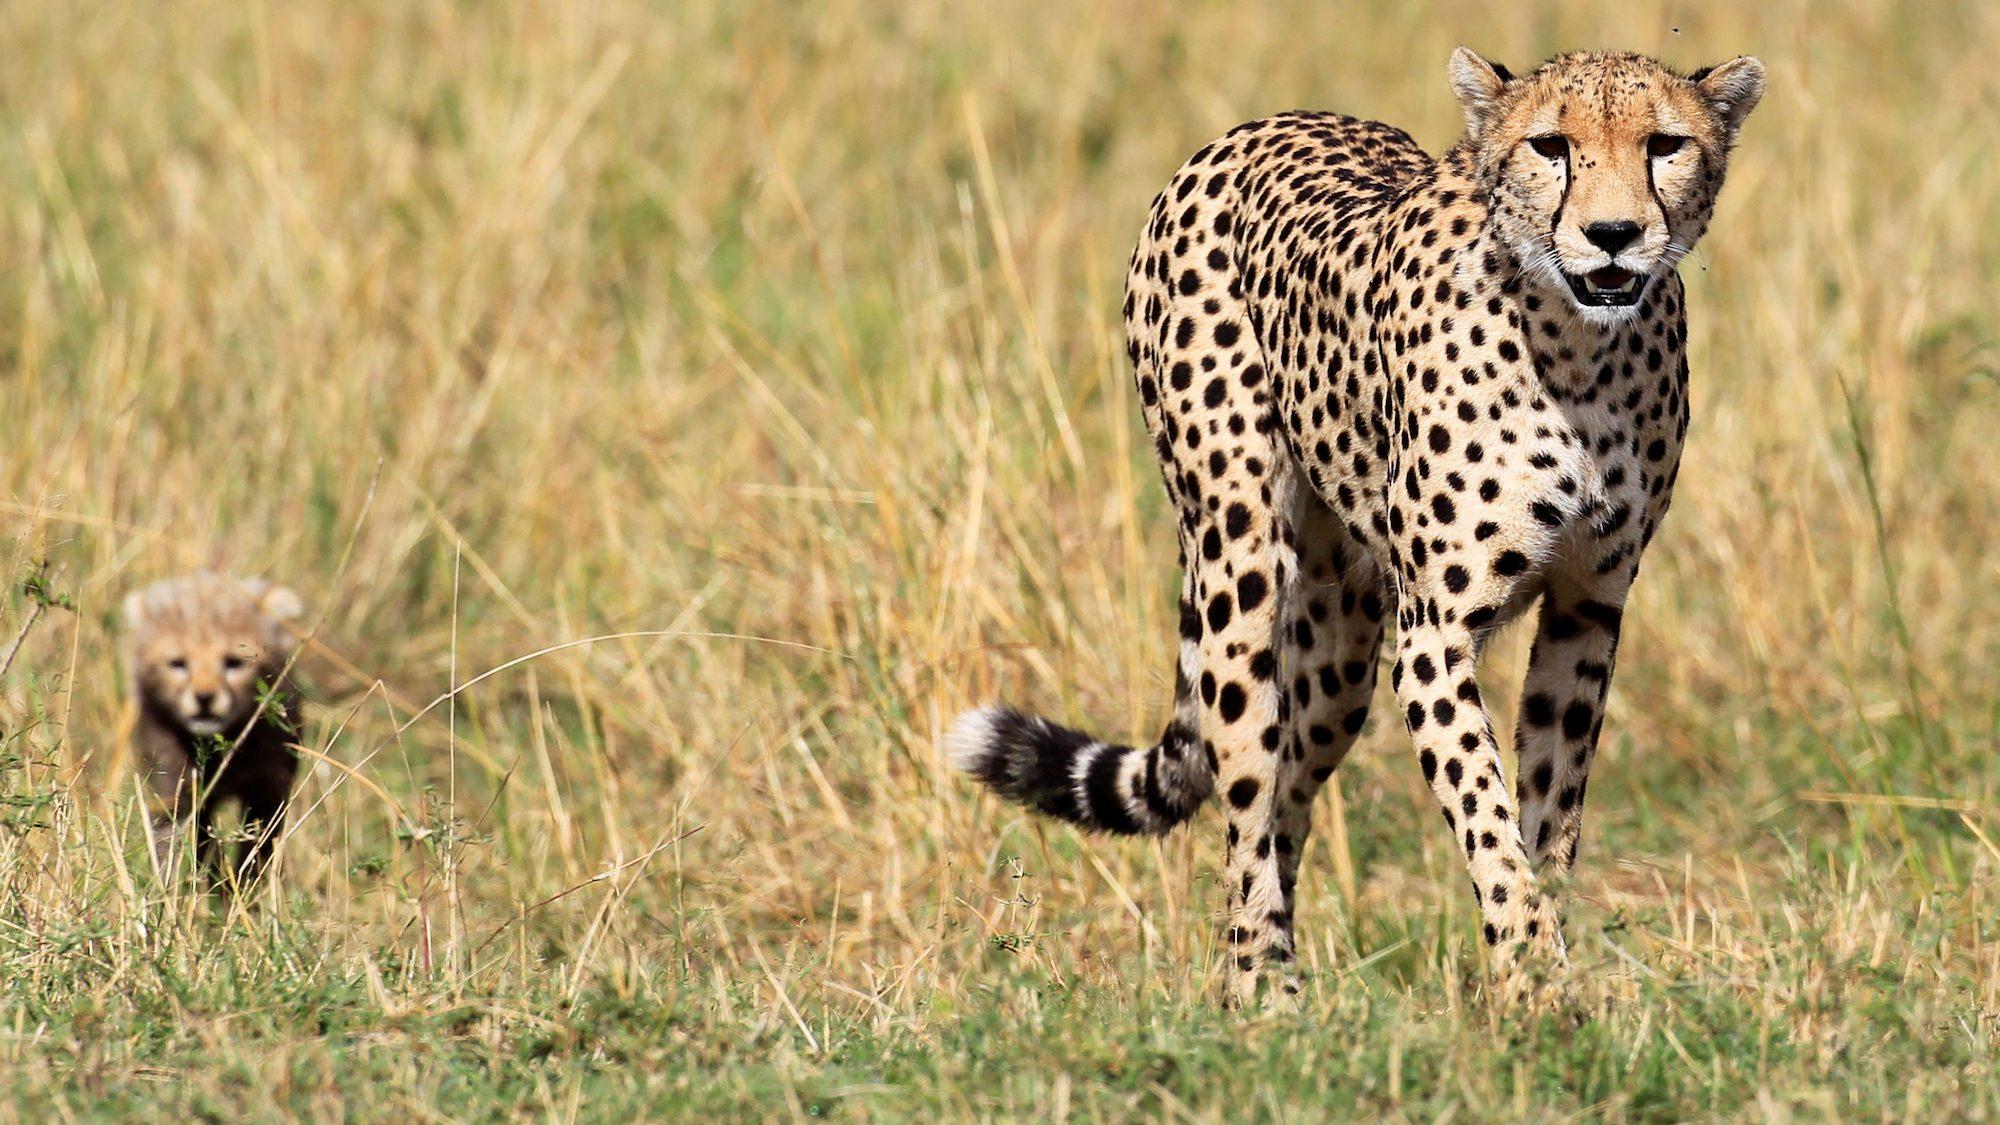 A cheetah and her cub walk on the plains in Masai Mara game reserve, Southwest of Kenya's capital Nairobi